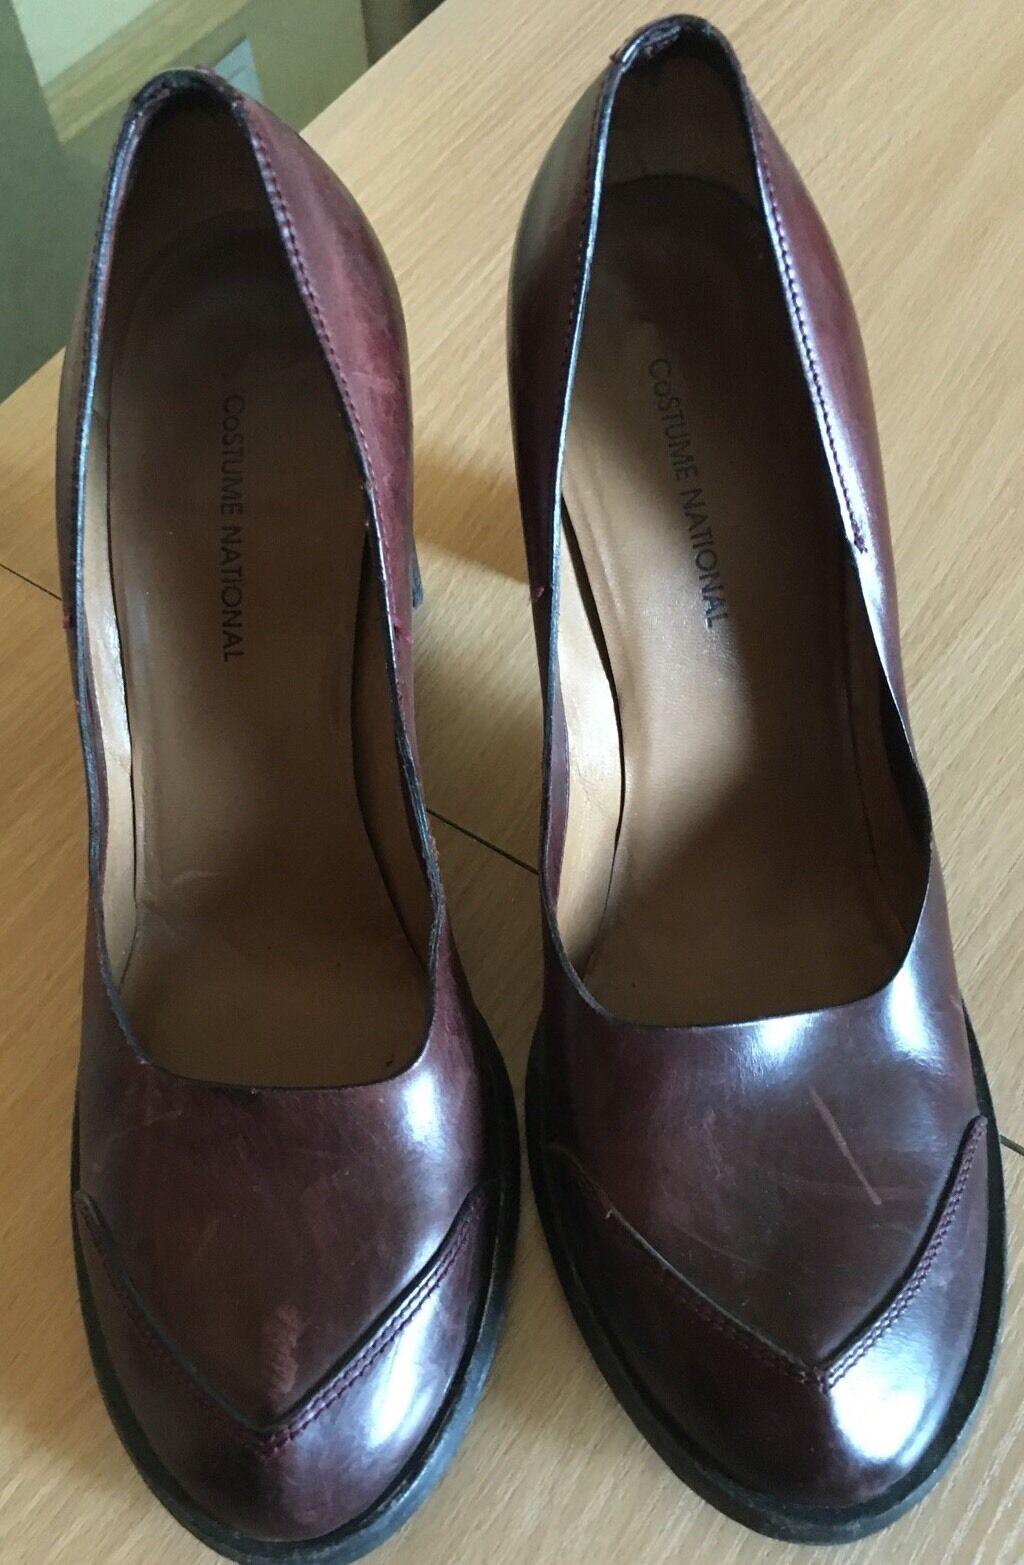 Costume National Pumps Burgundy Distressed Pelle Heel Shoes Sz 38.5 US 8.5